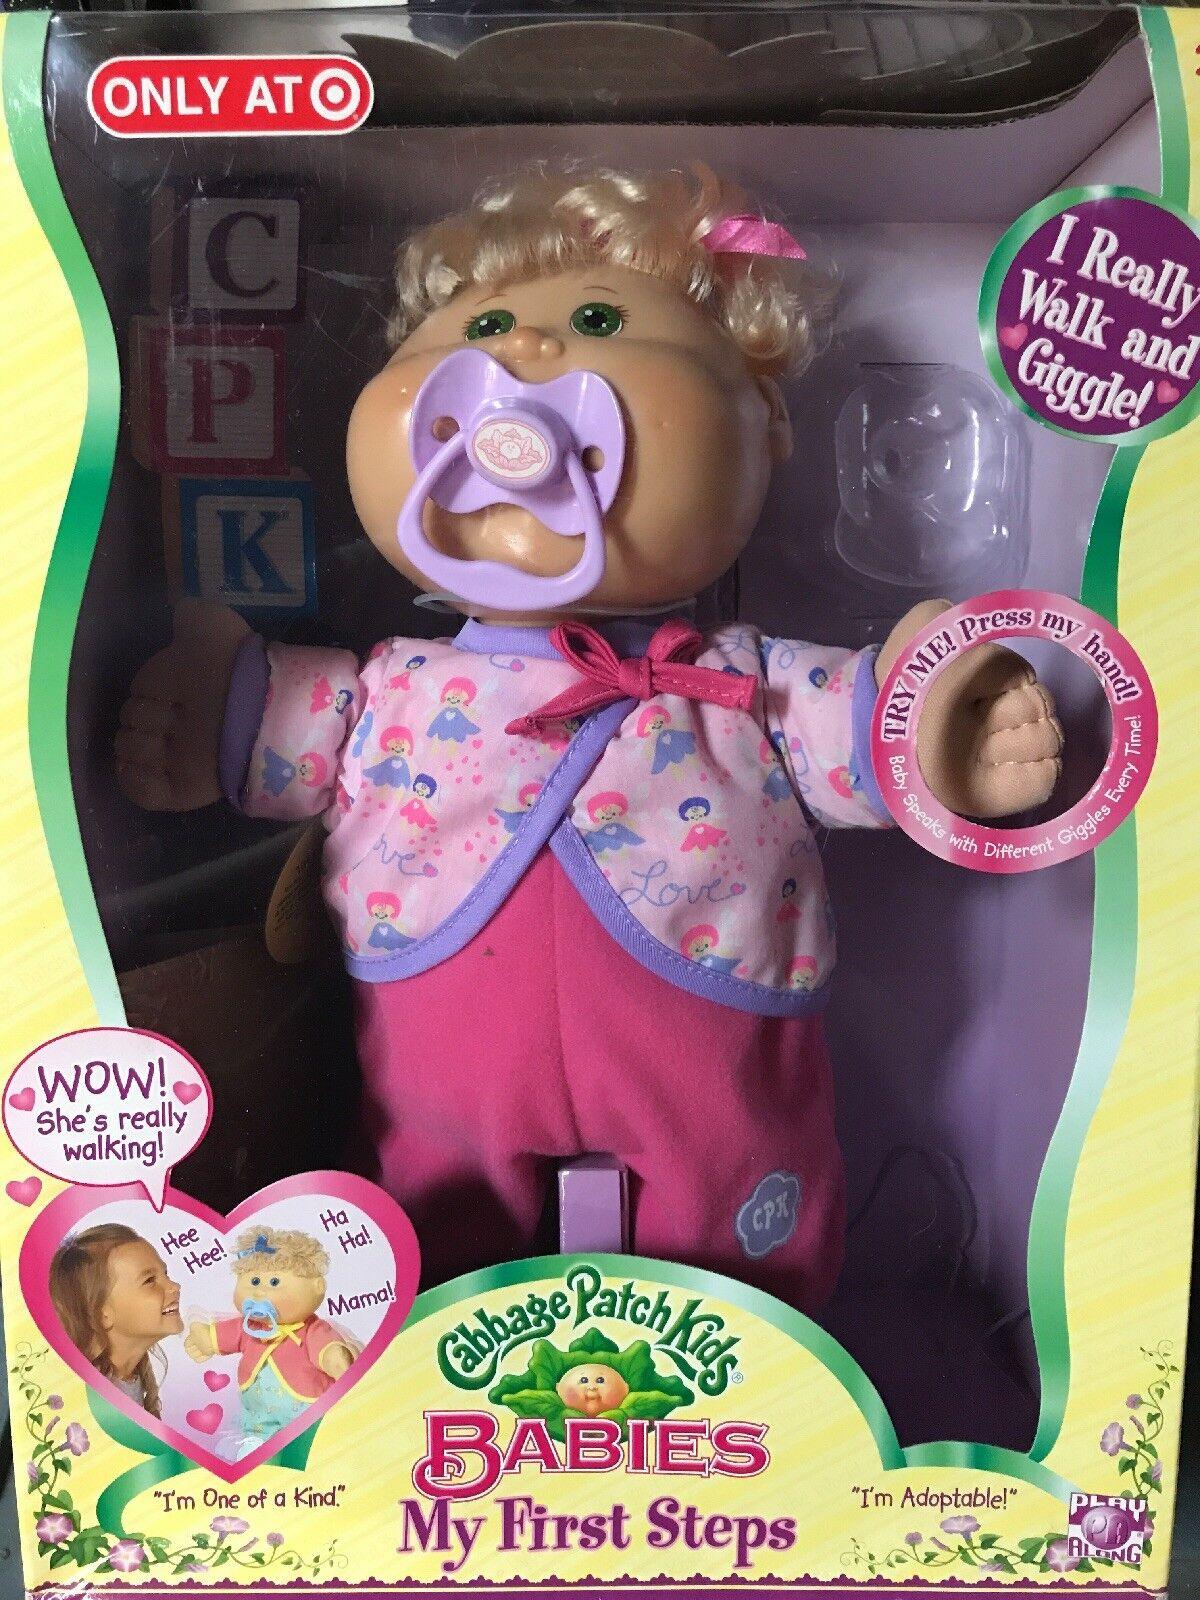 Dolls Generous Künstlerpuppe Porzellan Puppe 36 Cm Top Zustand Dolls & Bears